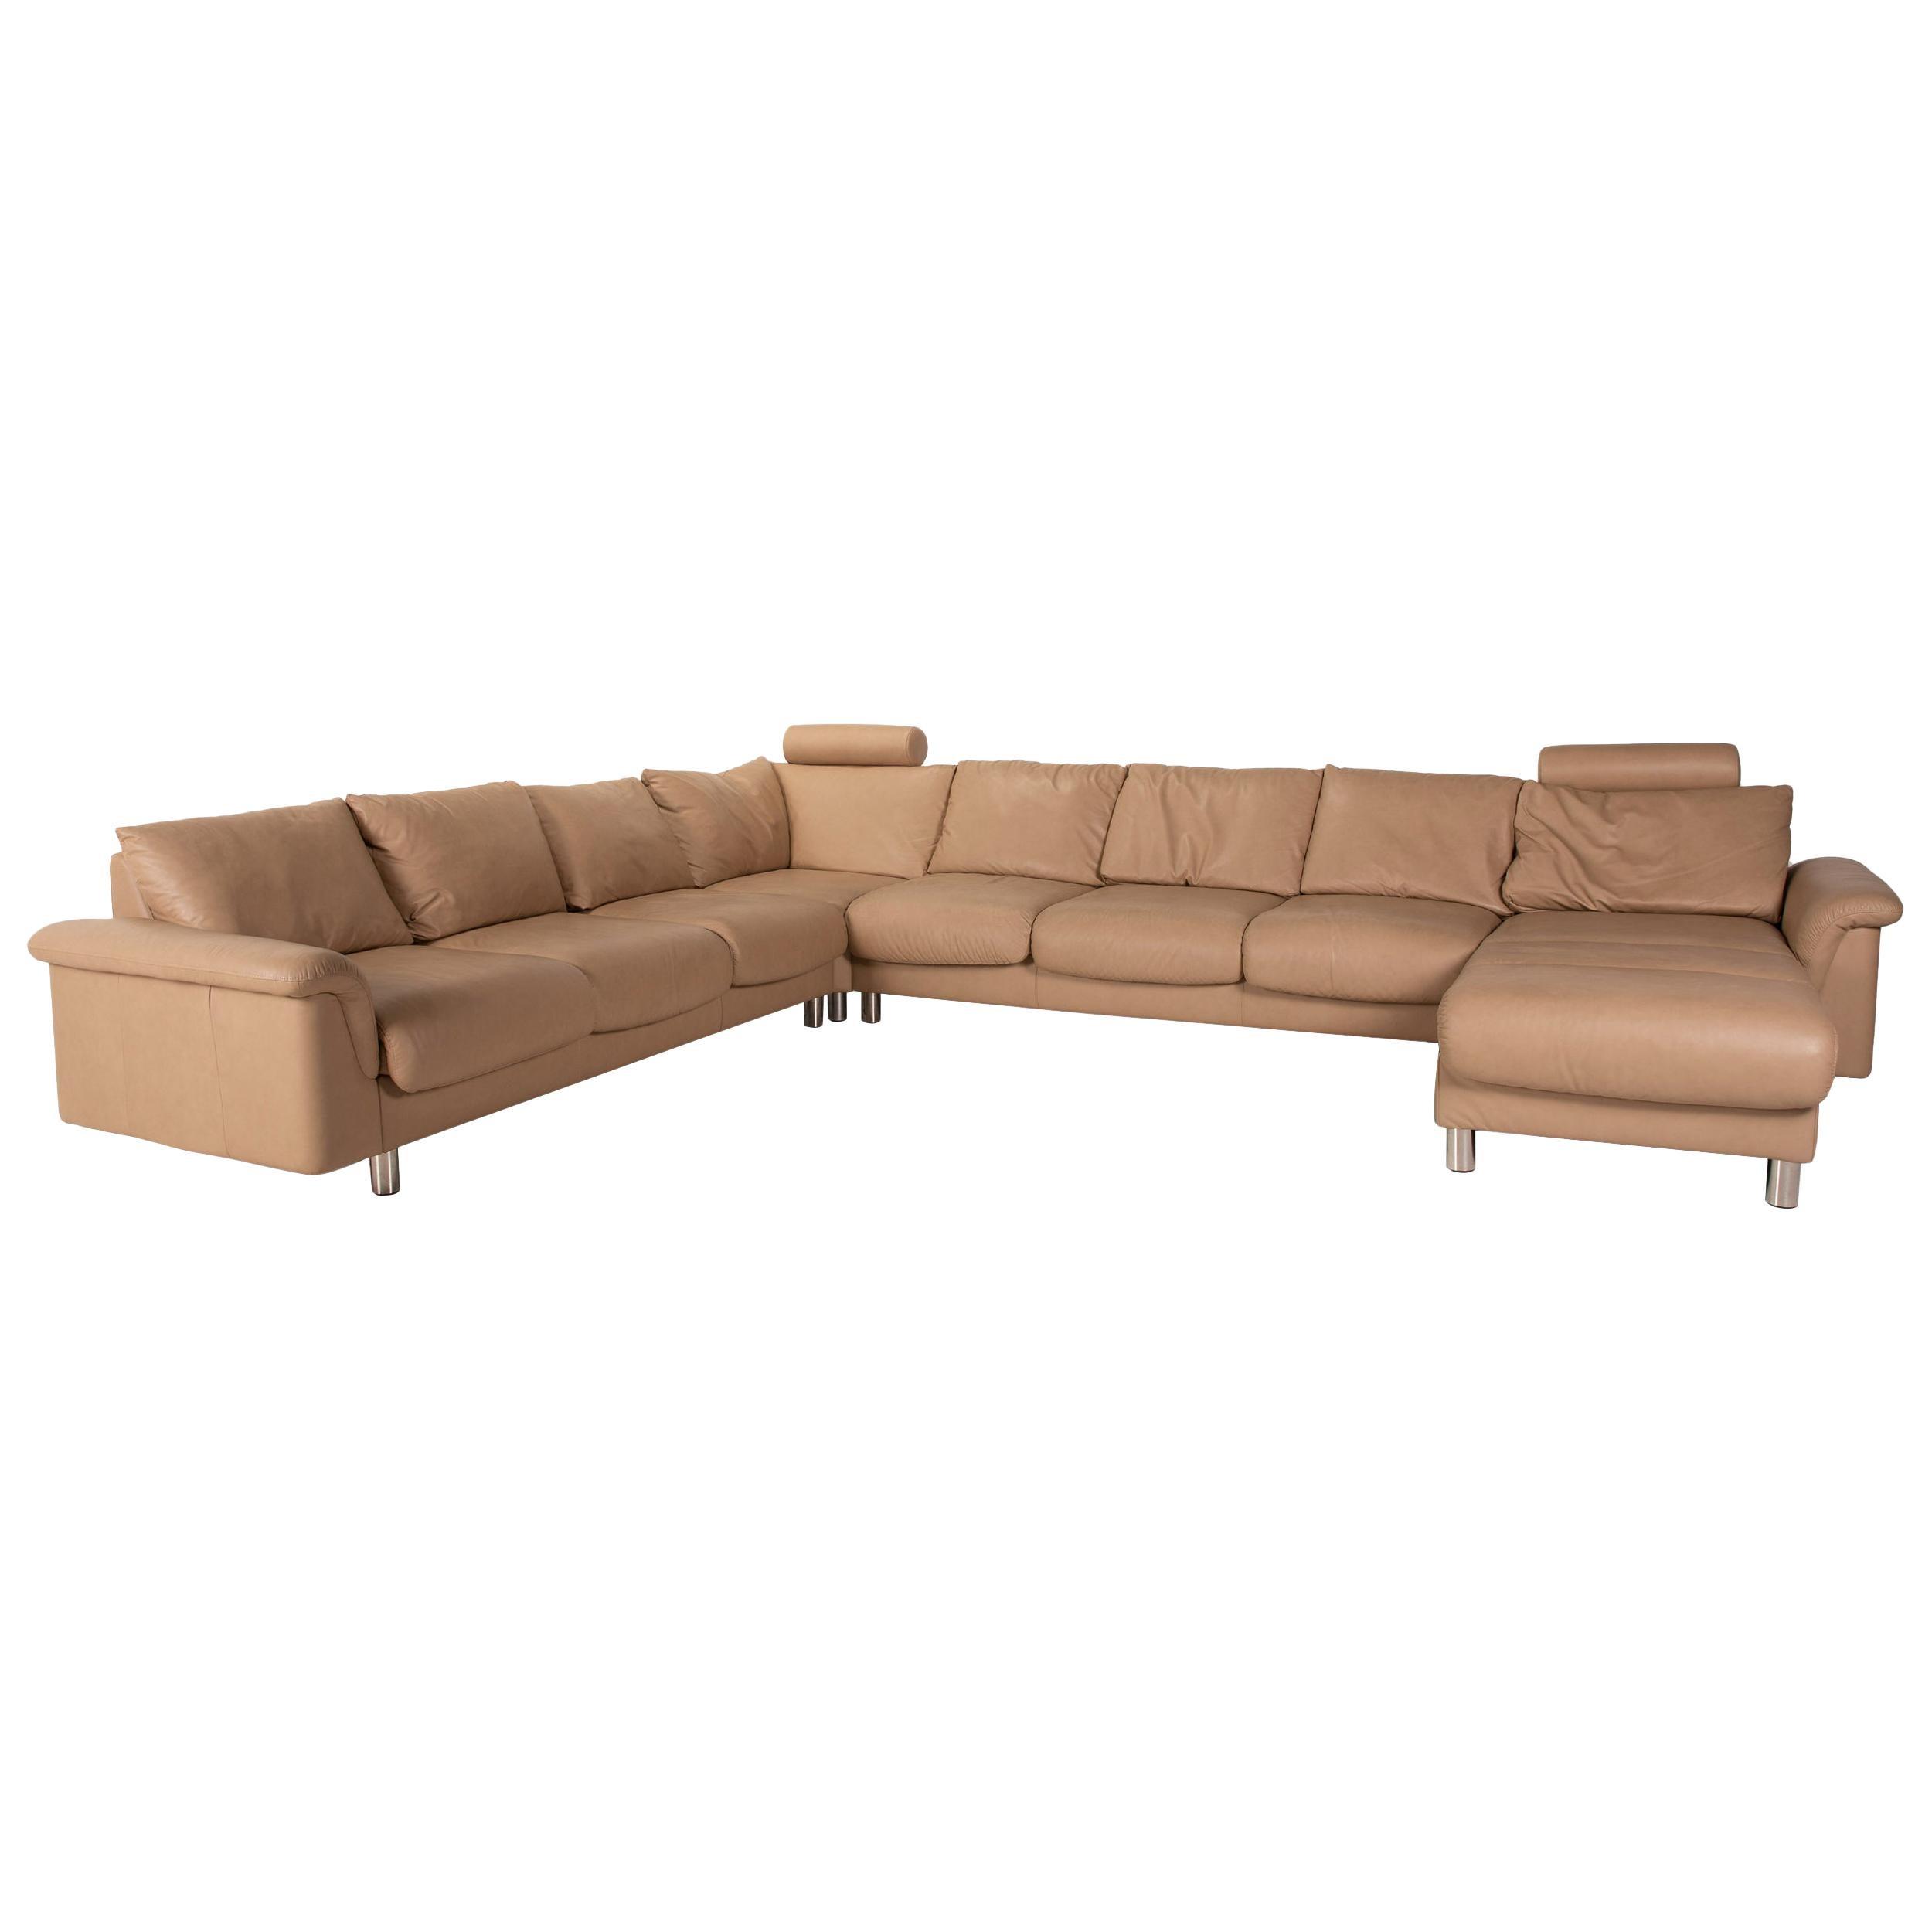 Stressless E300 Leather Sofa Beige Corner Sofa Cream Corner Sofa Couch U-Shape